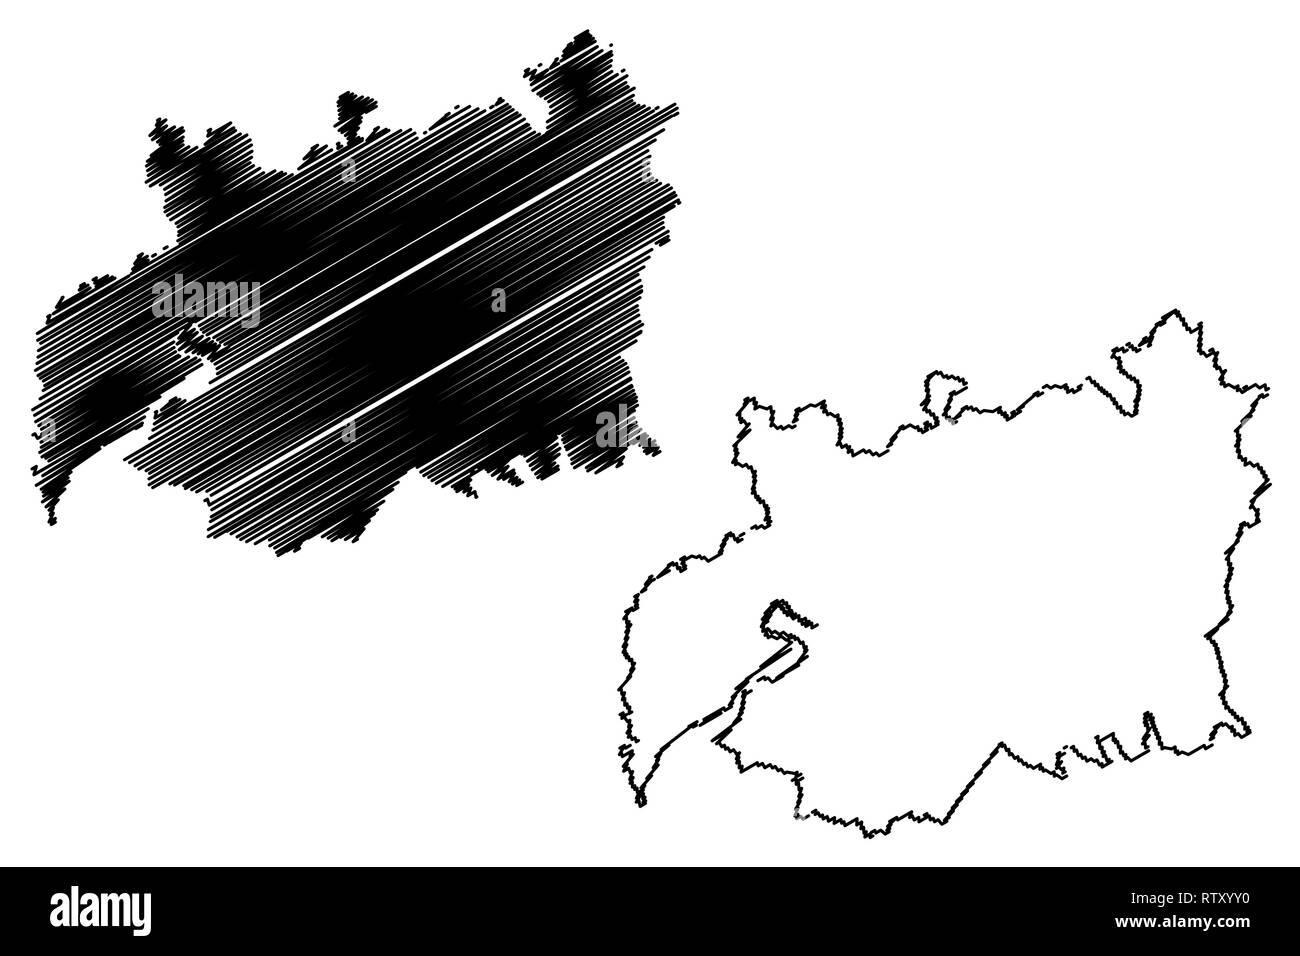 Gloucestershire (United Kingdom, England, Non-metropolitan county, shire county) map vector illustration, scribble sketch Gloucs. (Glos.) map - Stock Vector